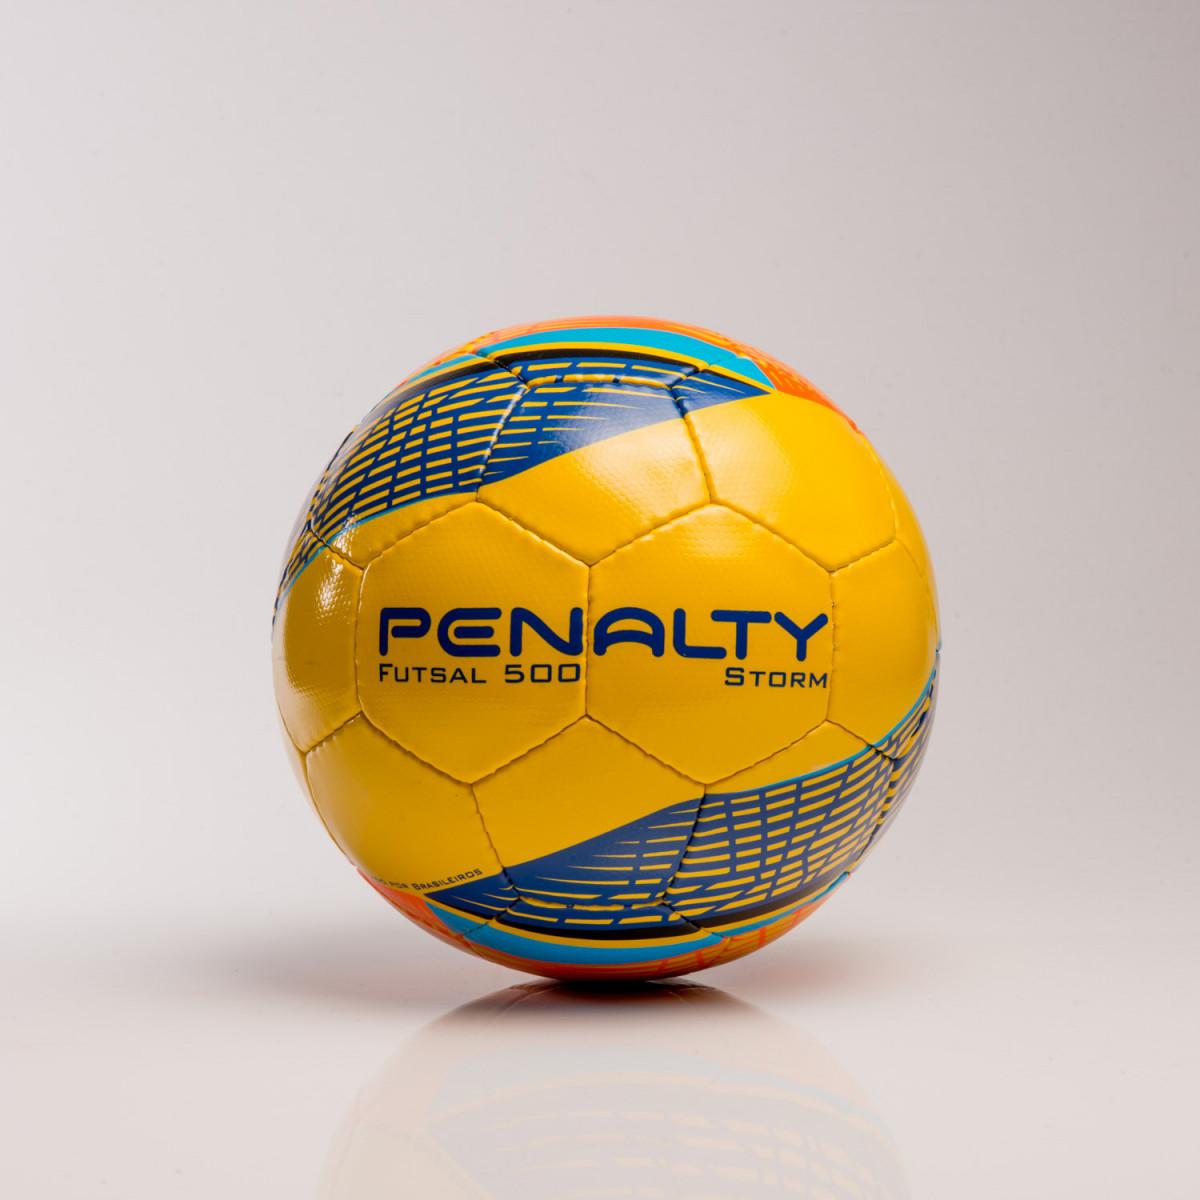 PELOTA PENALTY FUTSAL 500 STORM MANO